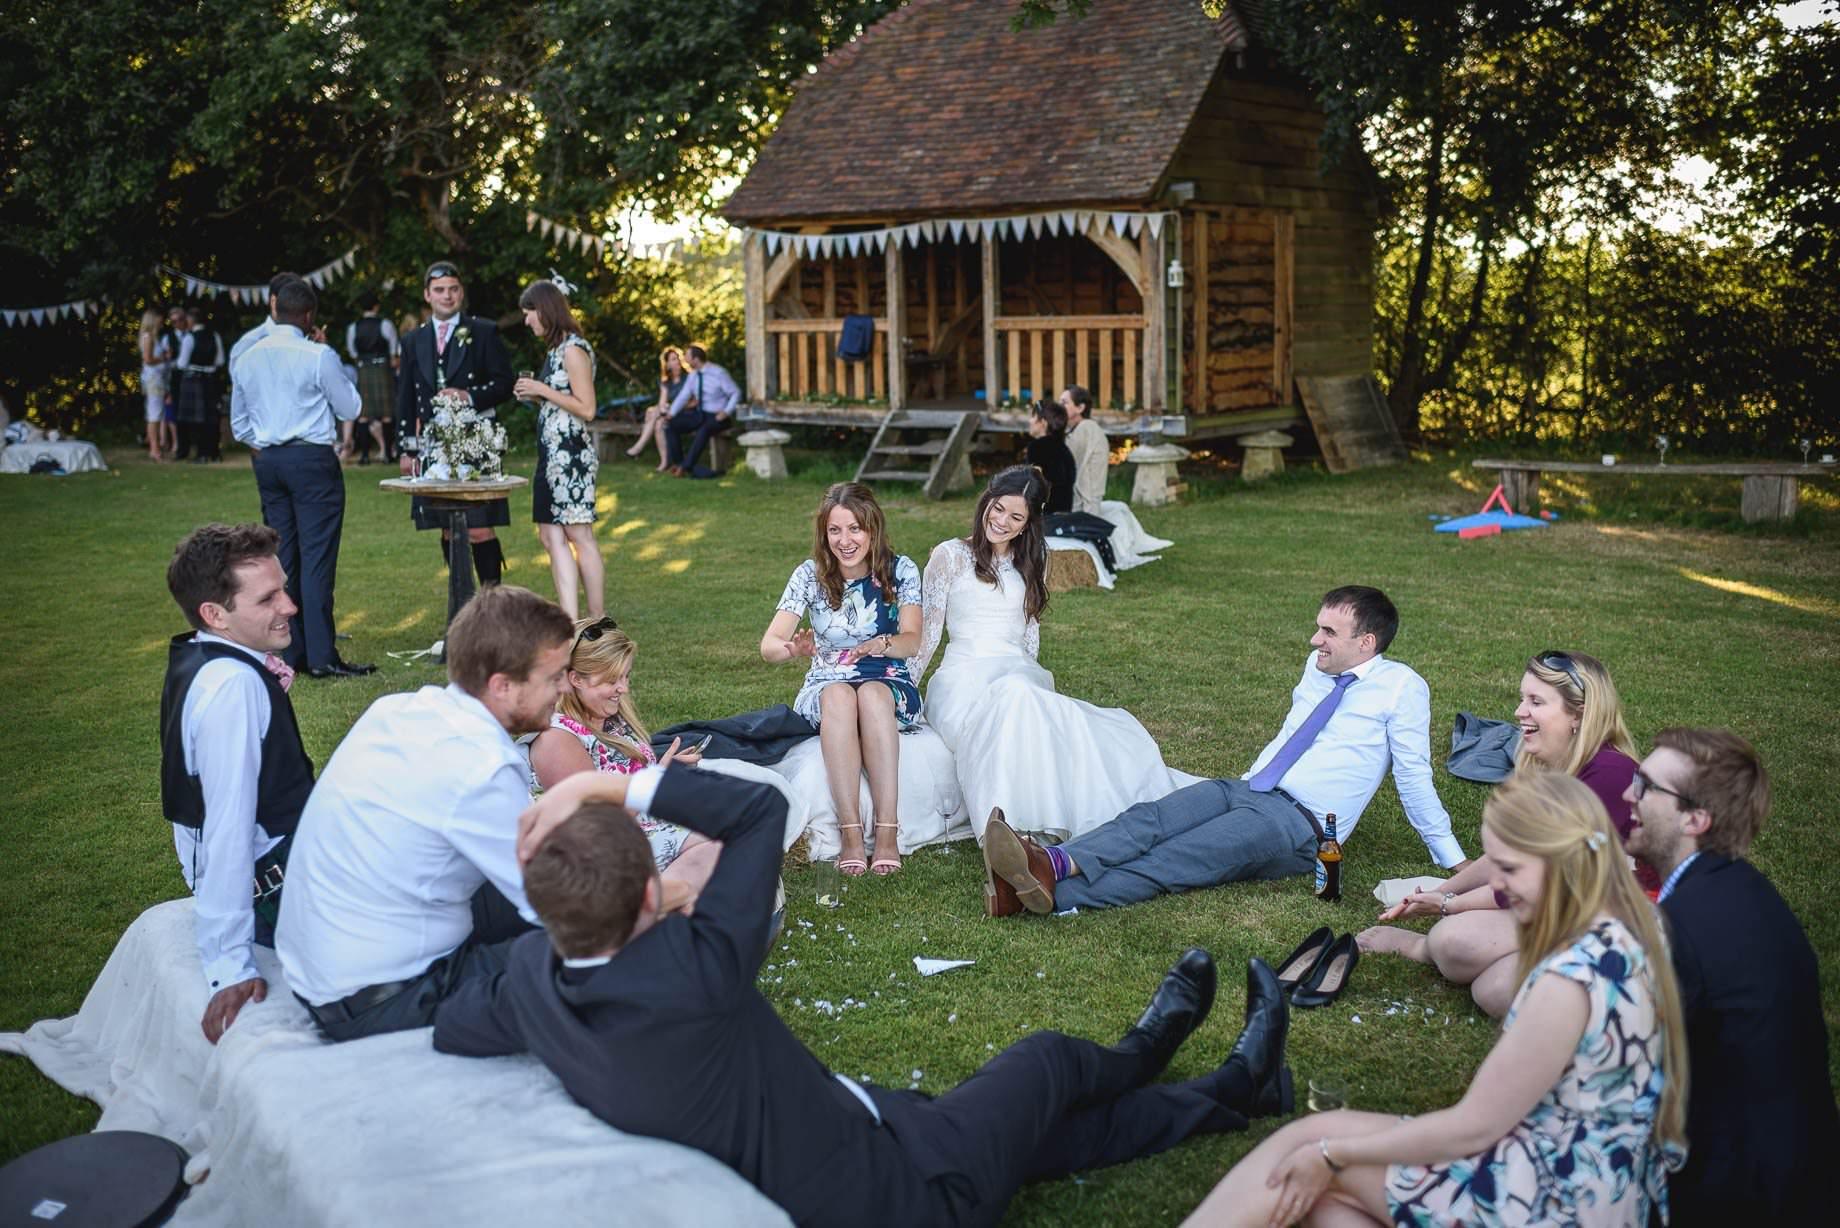 Gildings Barn wedding photography - Sarah and Steve (168 of 190)